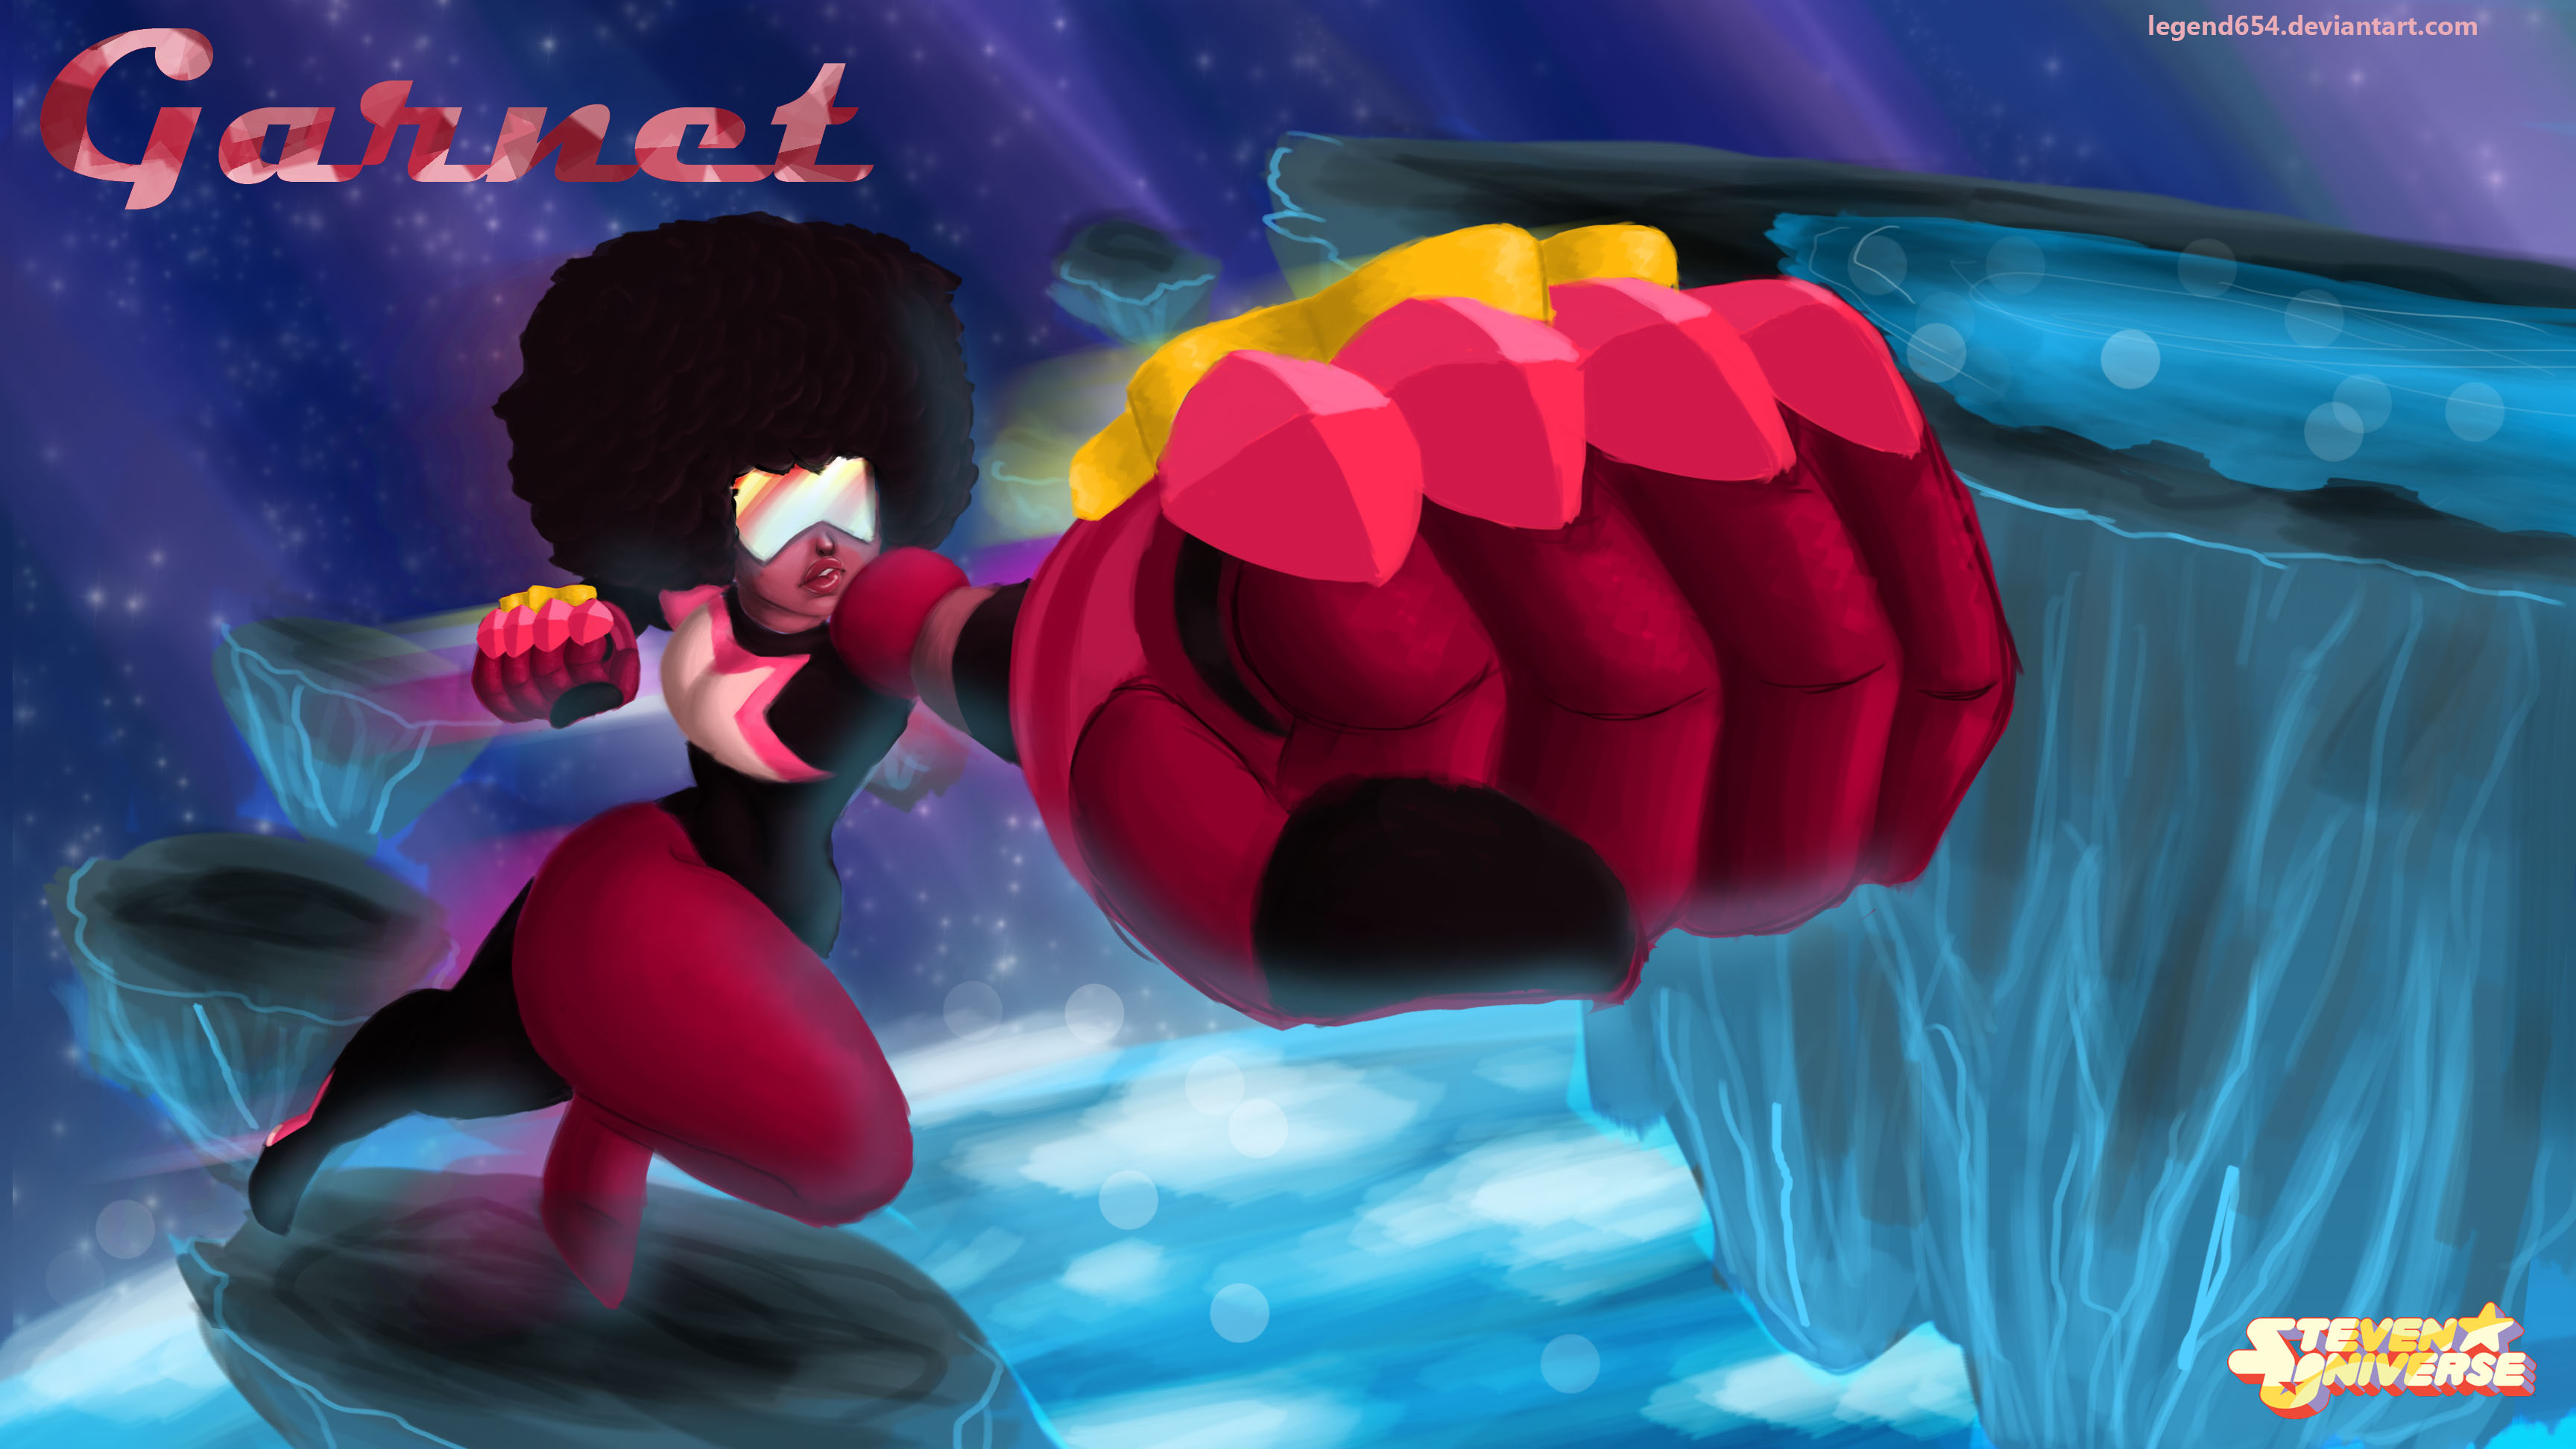 Garnet Steven Universe wallpaper by legend654 3456x1944